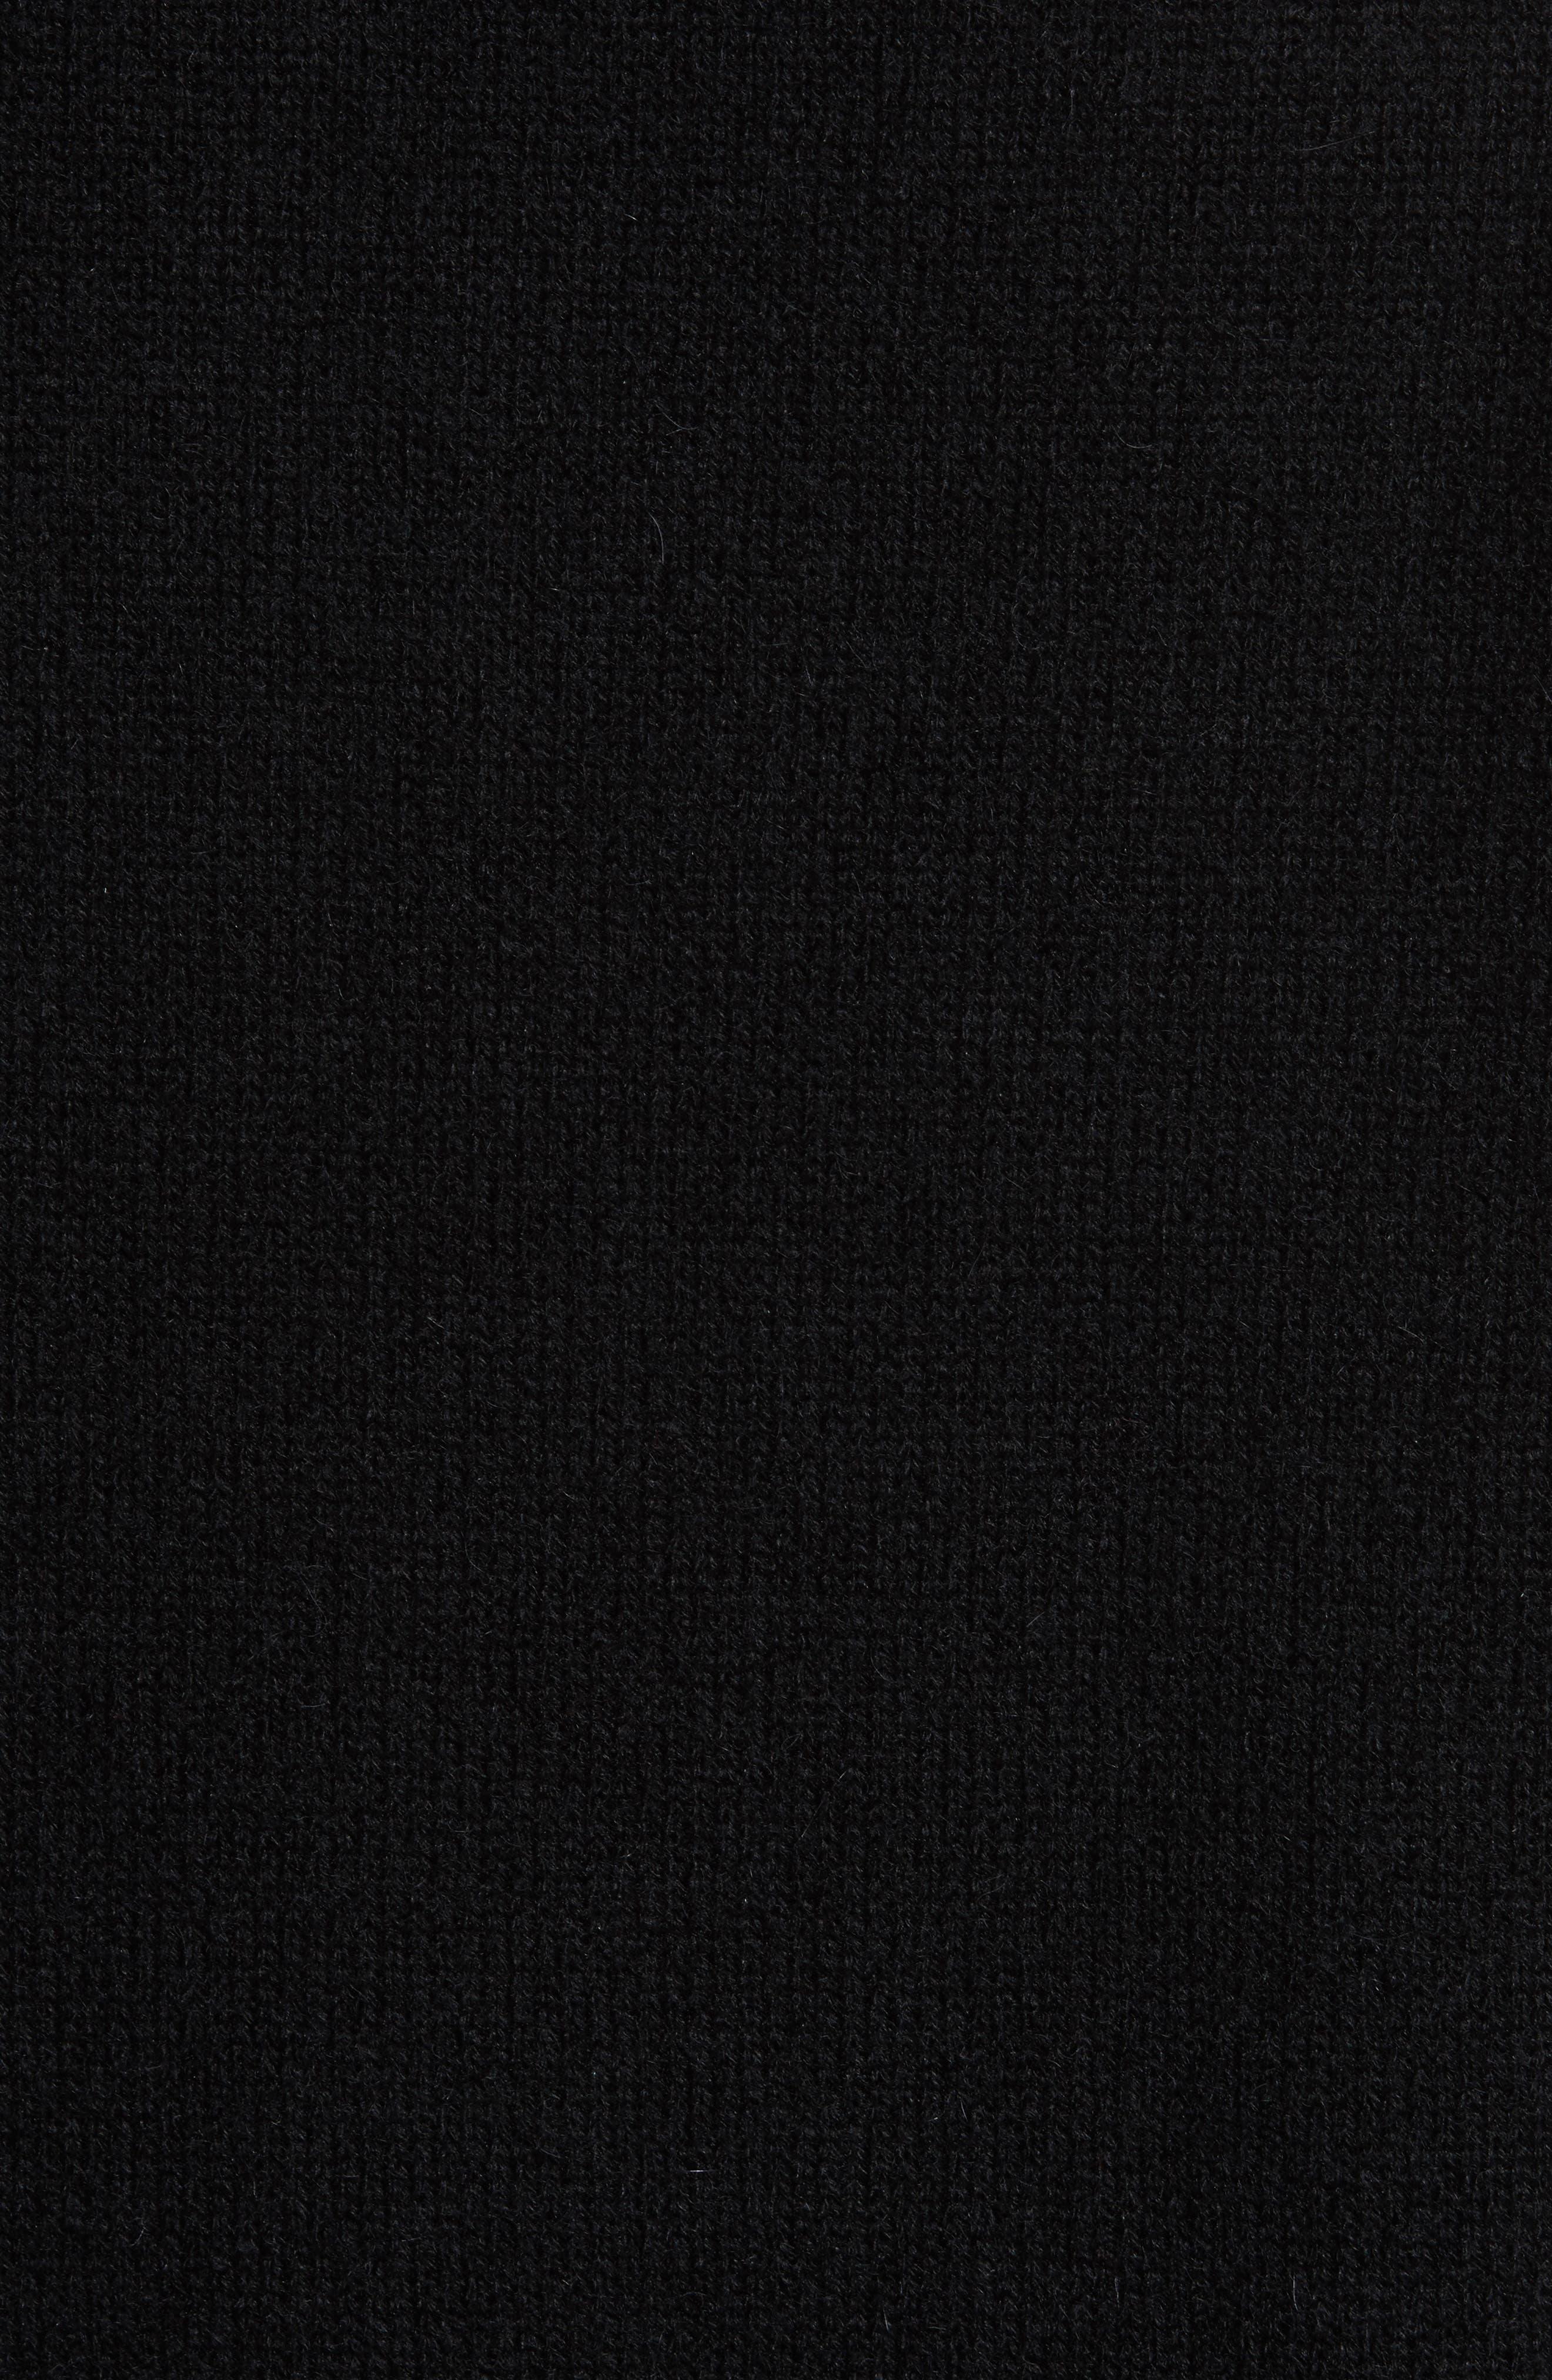 Alpaca Blend V-Neck Sweater,                             Alternate thumbnail 5, color,                             Black